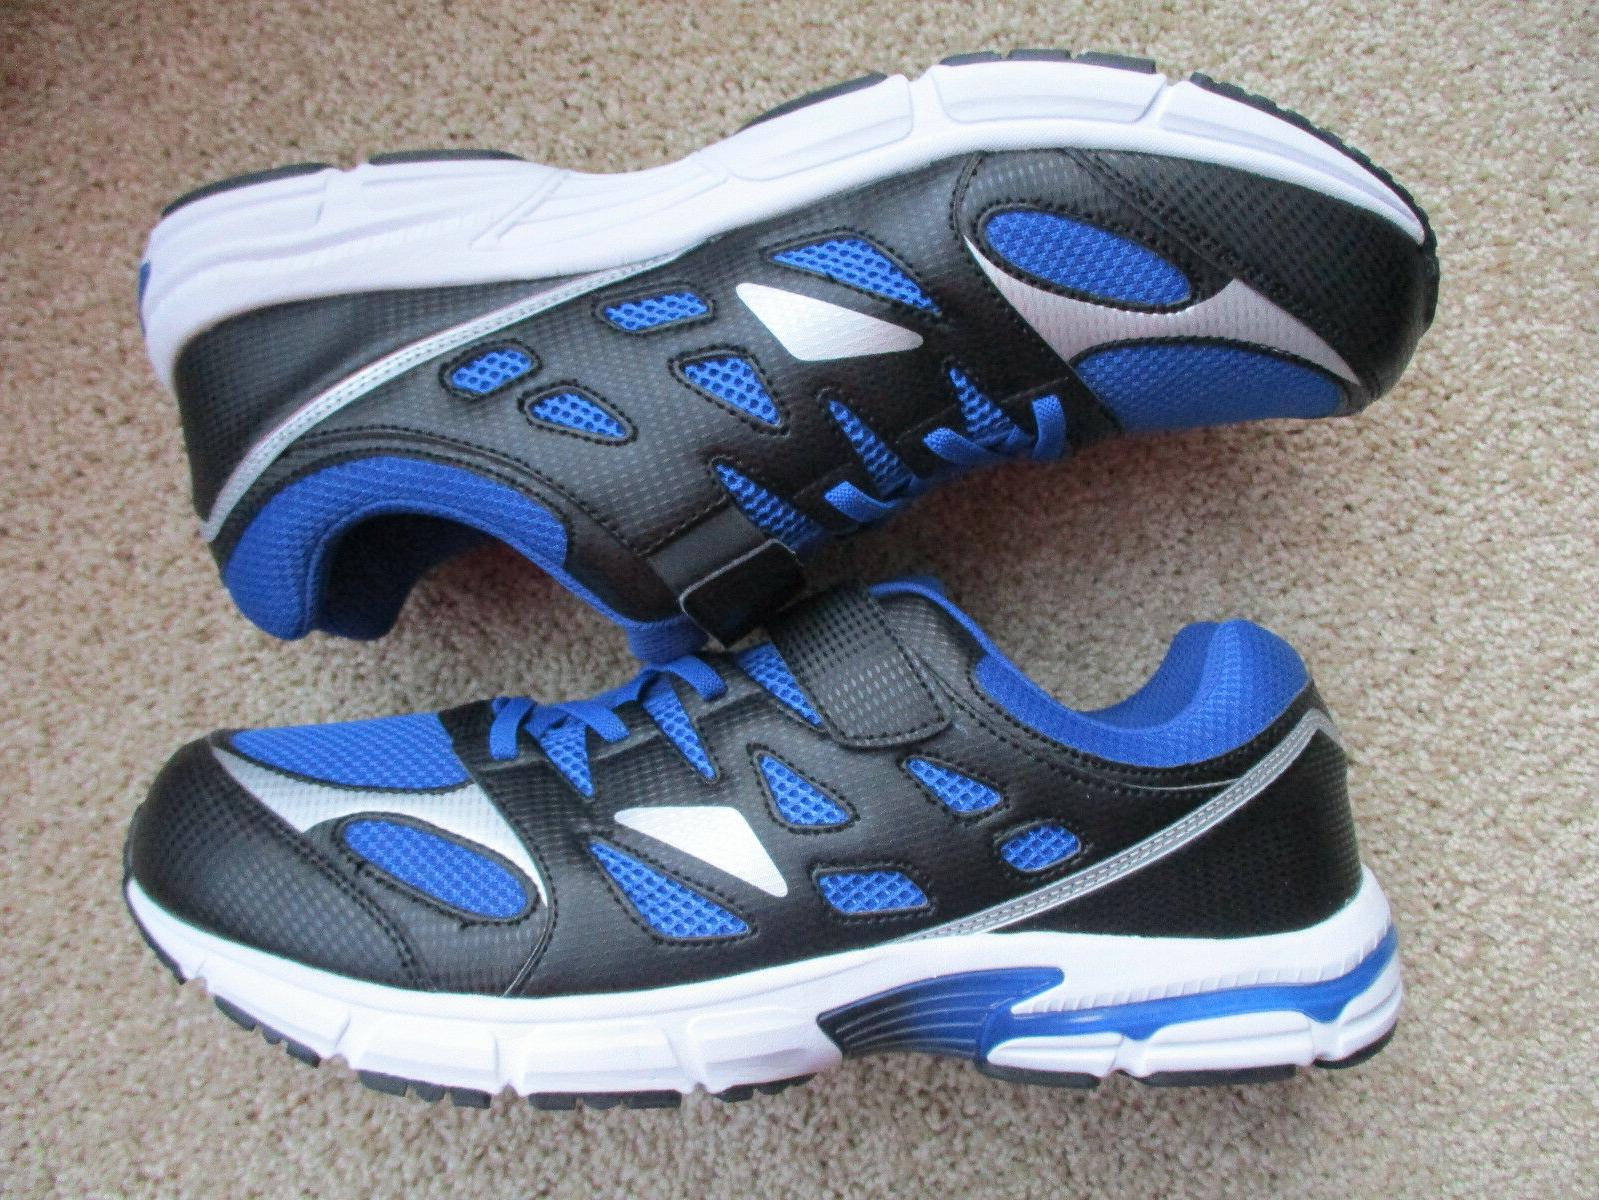 Brand New tennis shoes size Blue Black, White, #10797